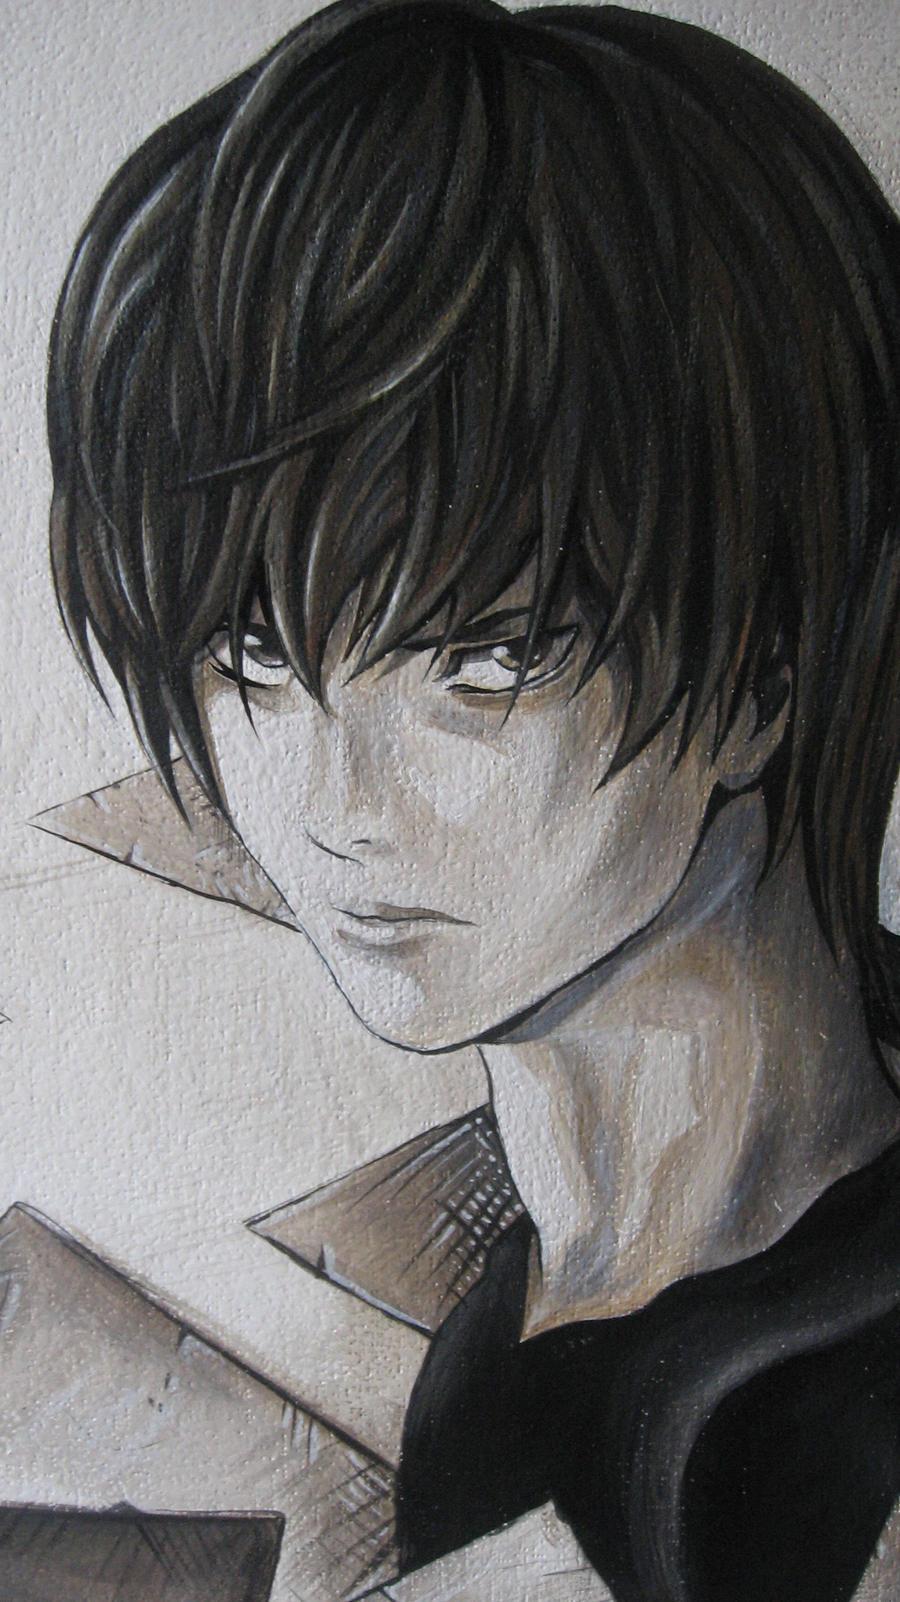 DEATH NOTE by serukian